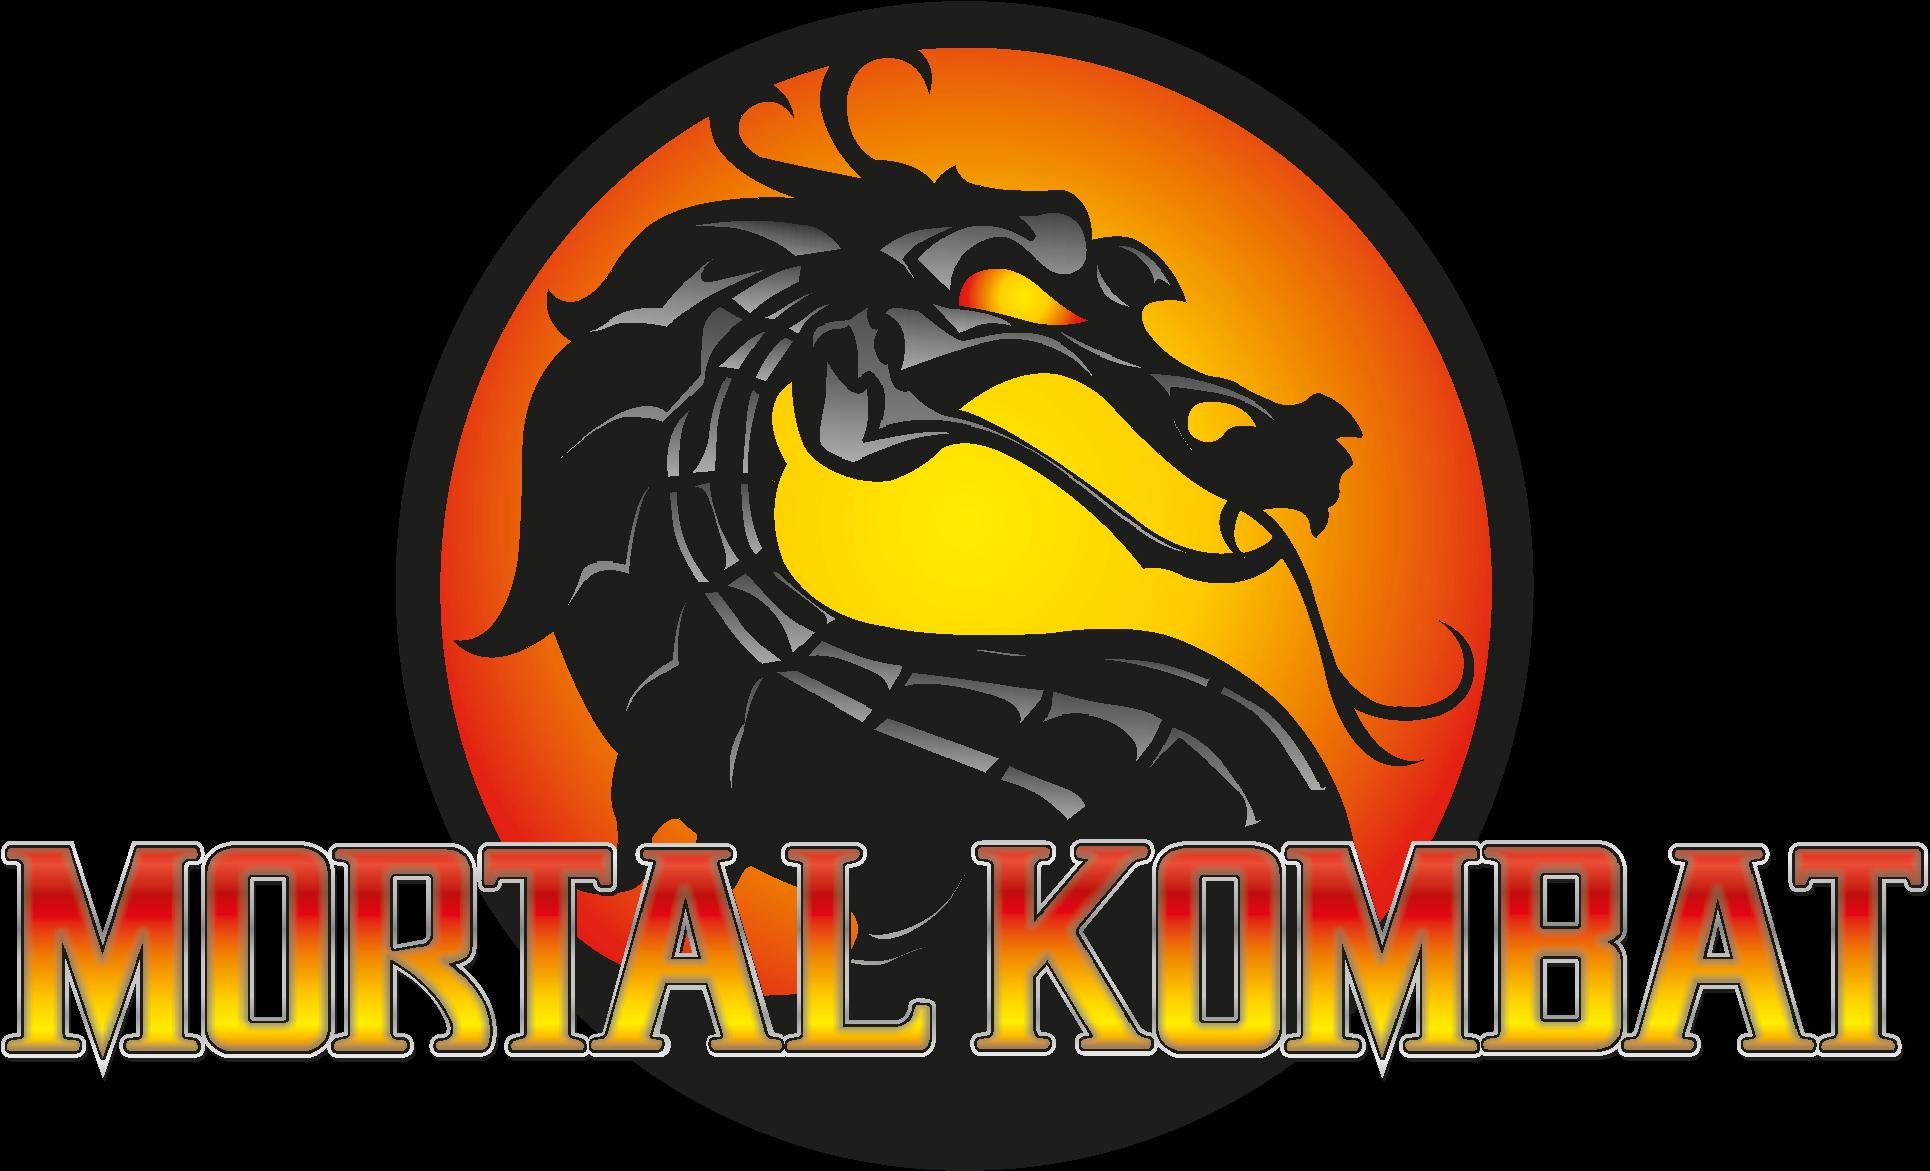 Download Mortal Kombat Logo Png, Transparent Png.